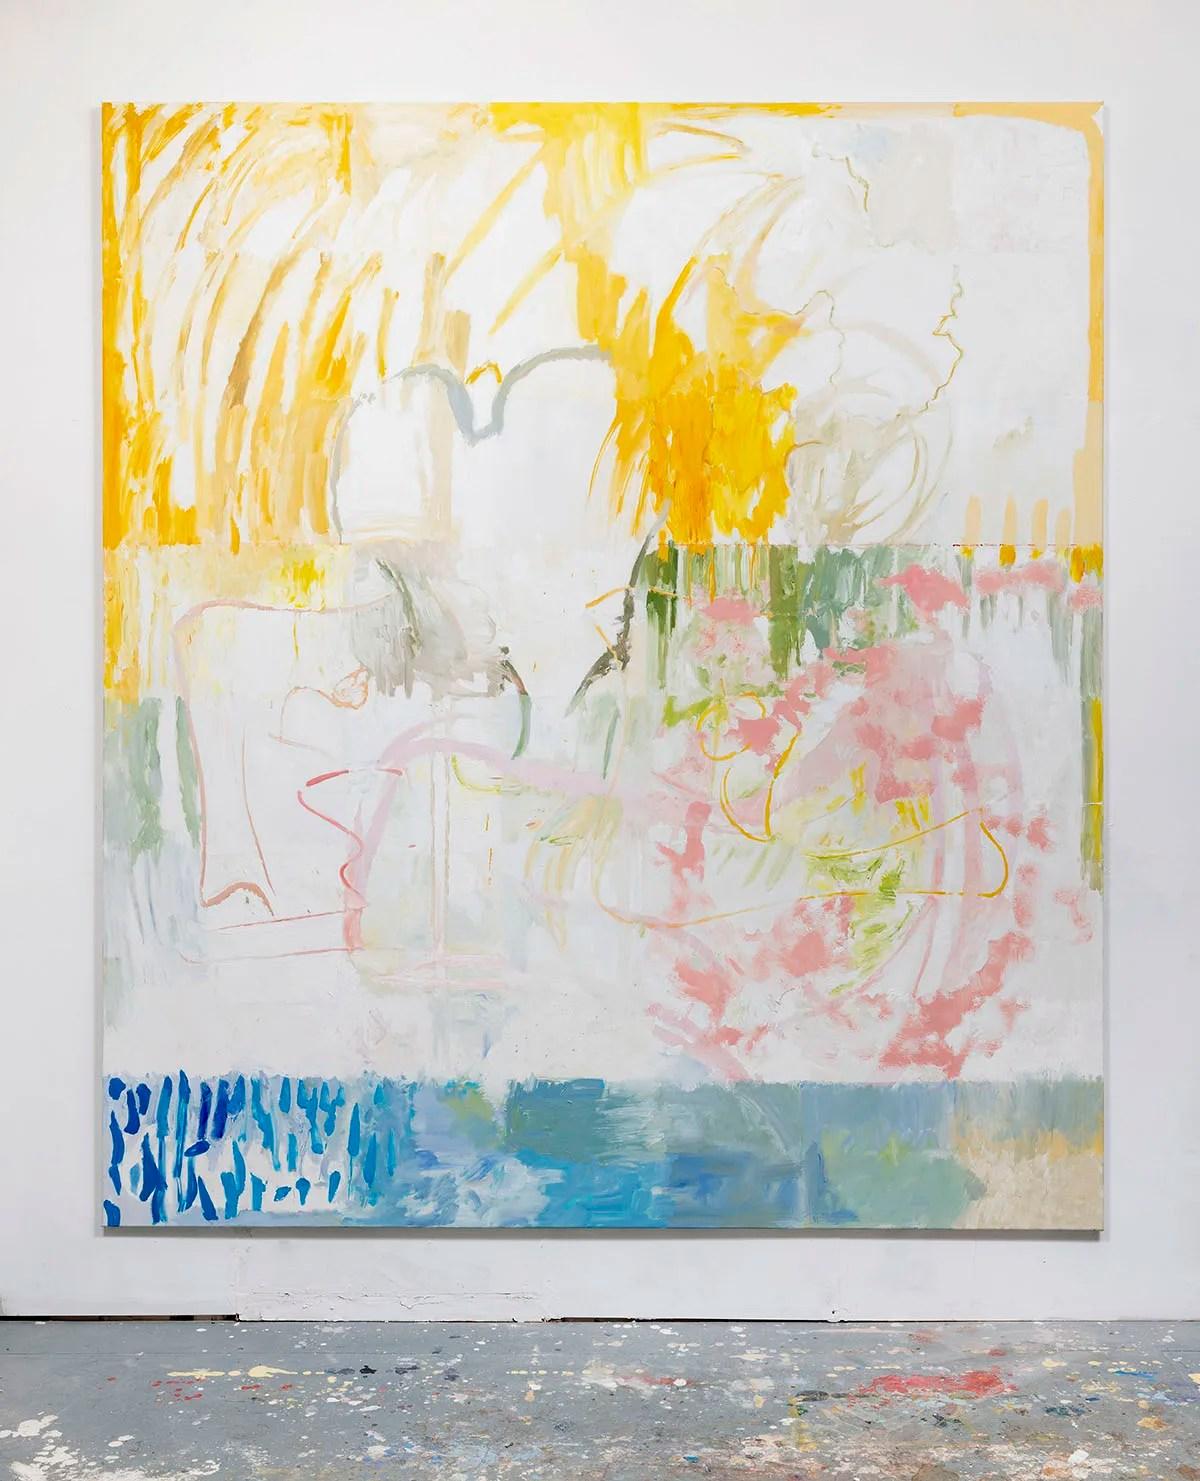 Crop Rotation XXXV, 2019 – Daniel Pettitt